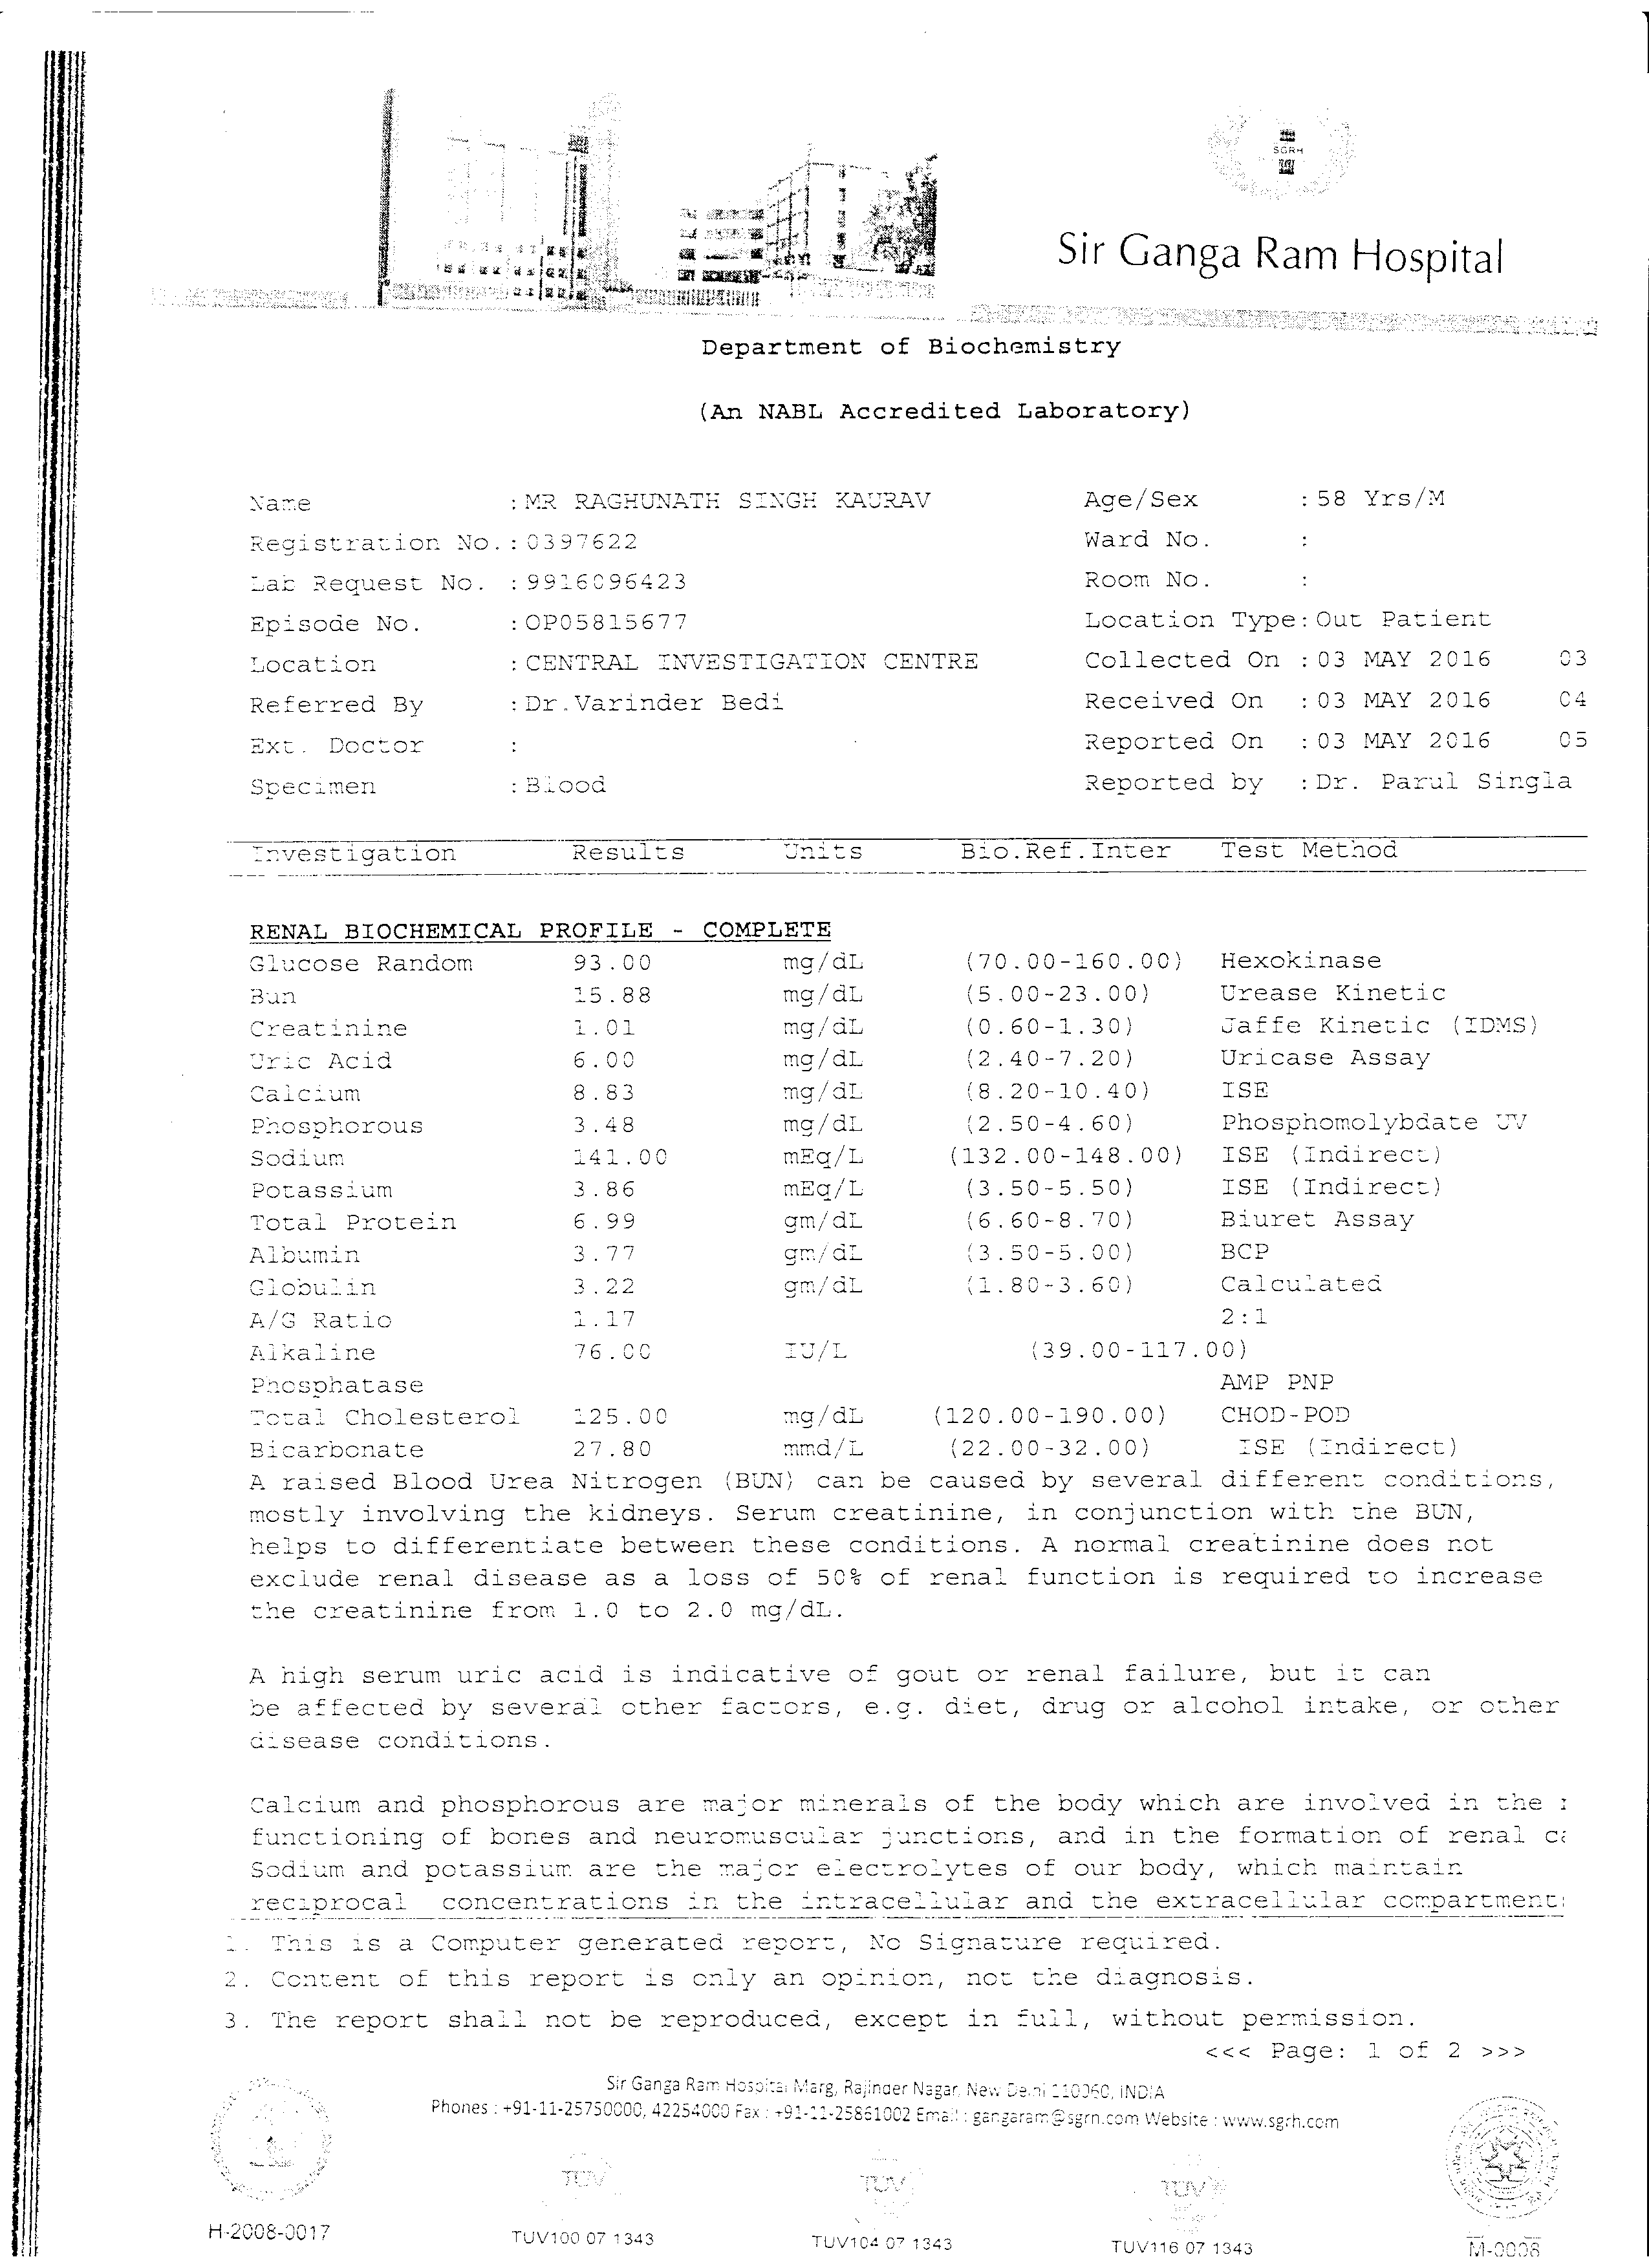 RAGHUNATH-SINGH-KAURAV-57-Yrs-DVT-treatment-8